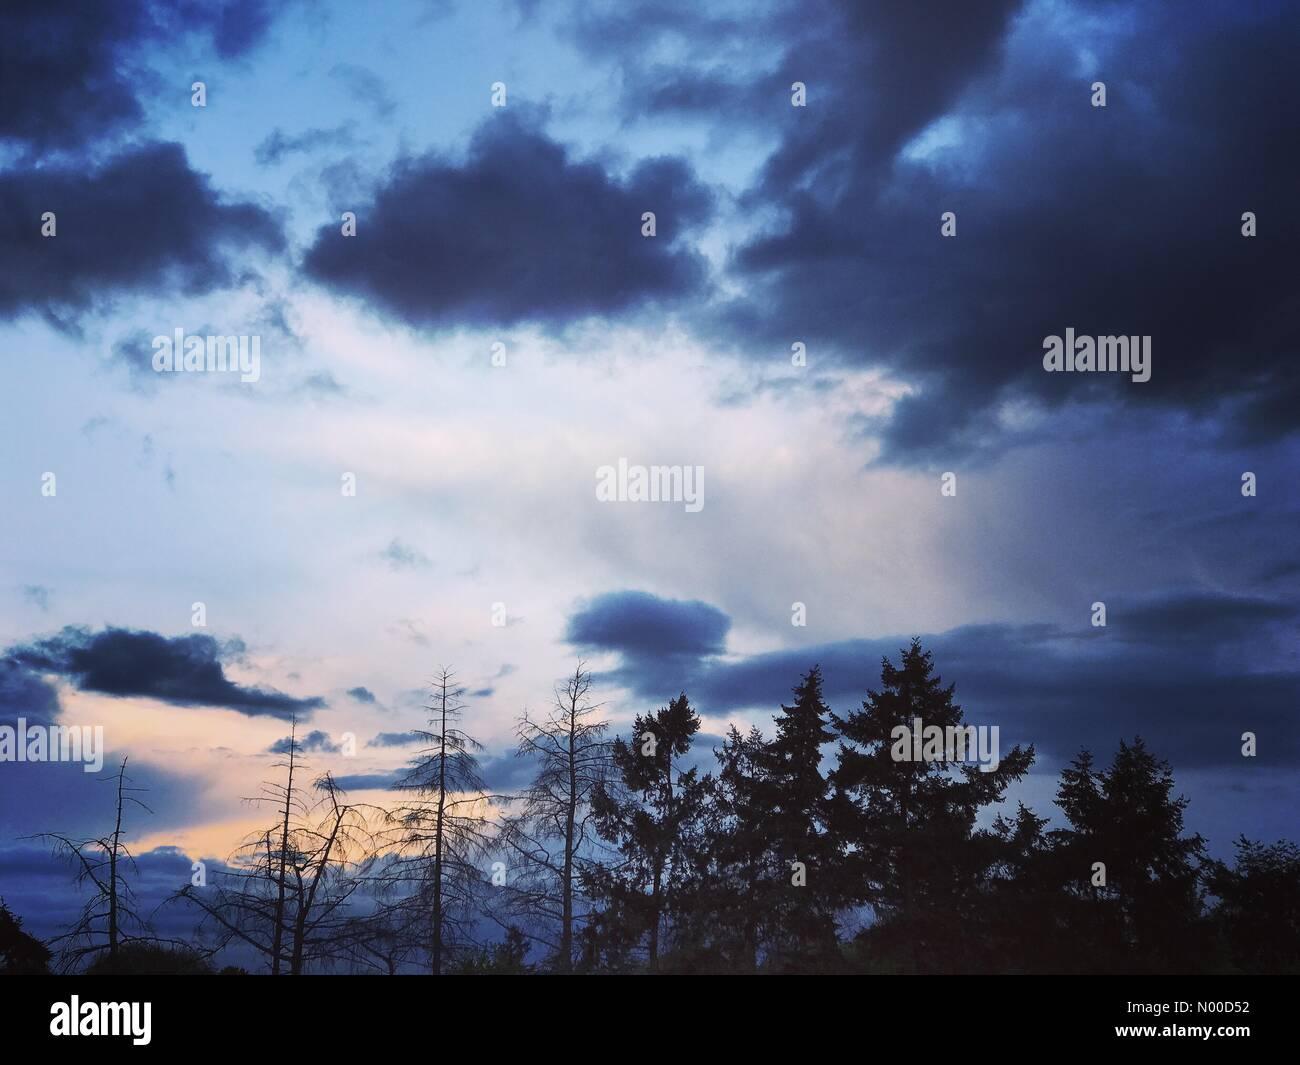 Tuesley Ln, Godalming, UK. 25th Apr, 2017. UK Weather: Storm clouds over Godalming. Tuesley Farm, Godalming. 25th - Stock Image